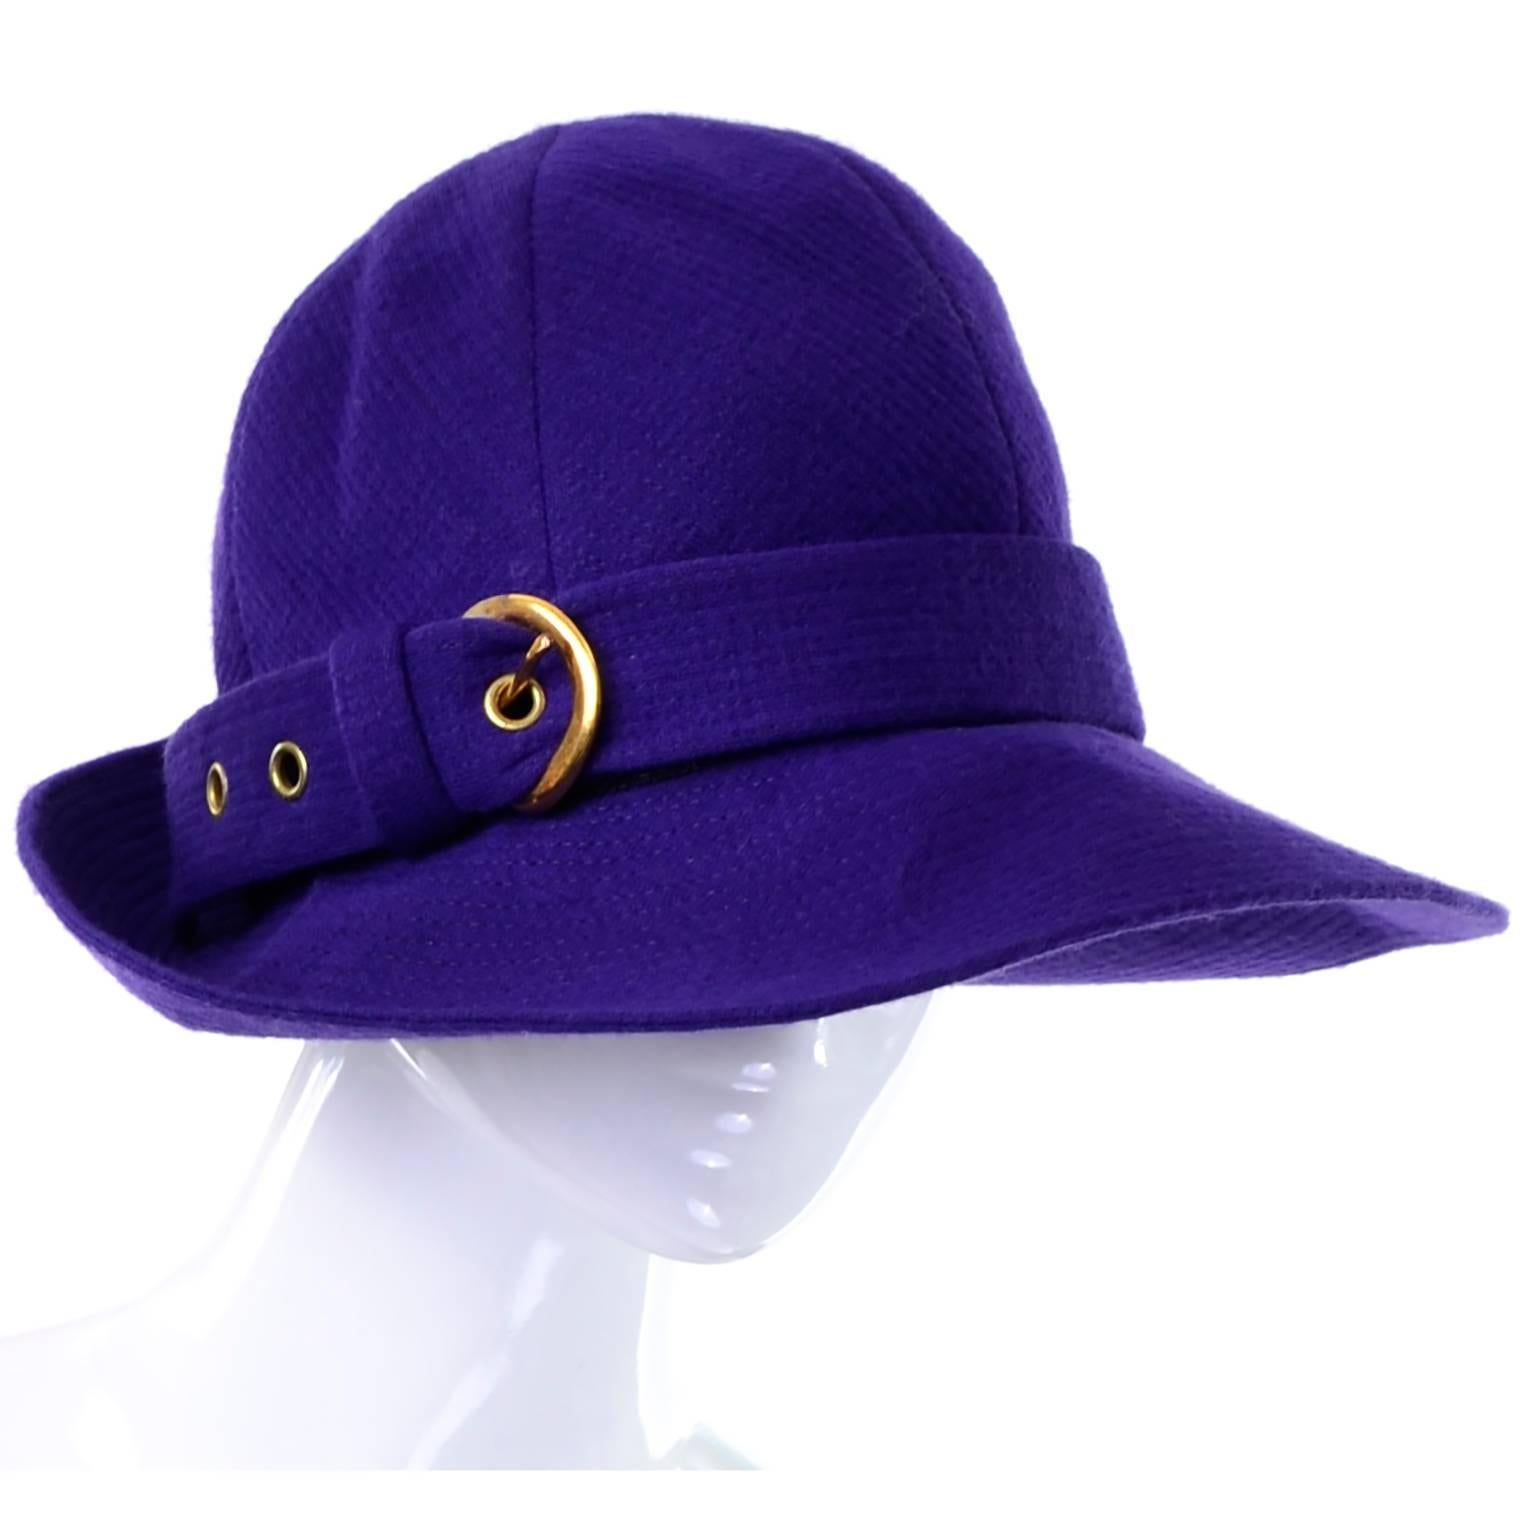 8e1b6da7904 1960s YSL Vintage Purple Wool Hat Designed by Yves Saint Laurent 22